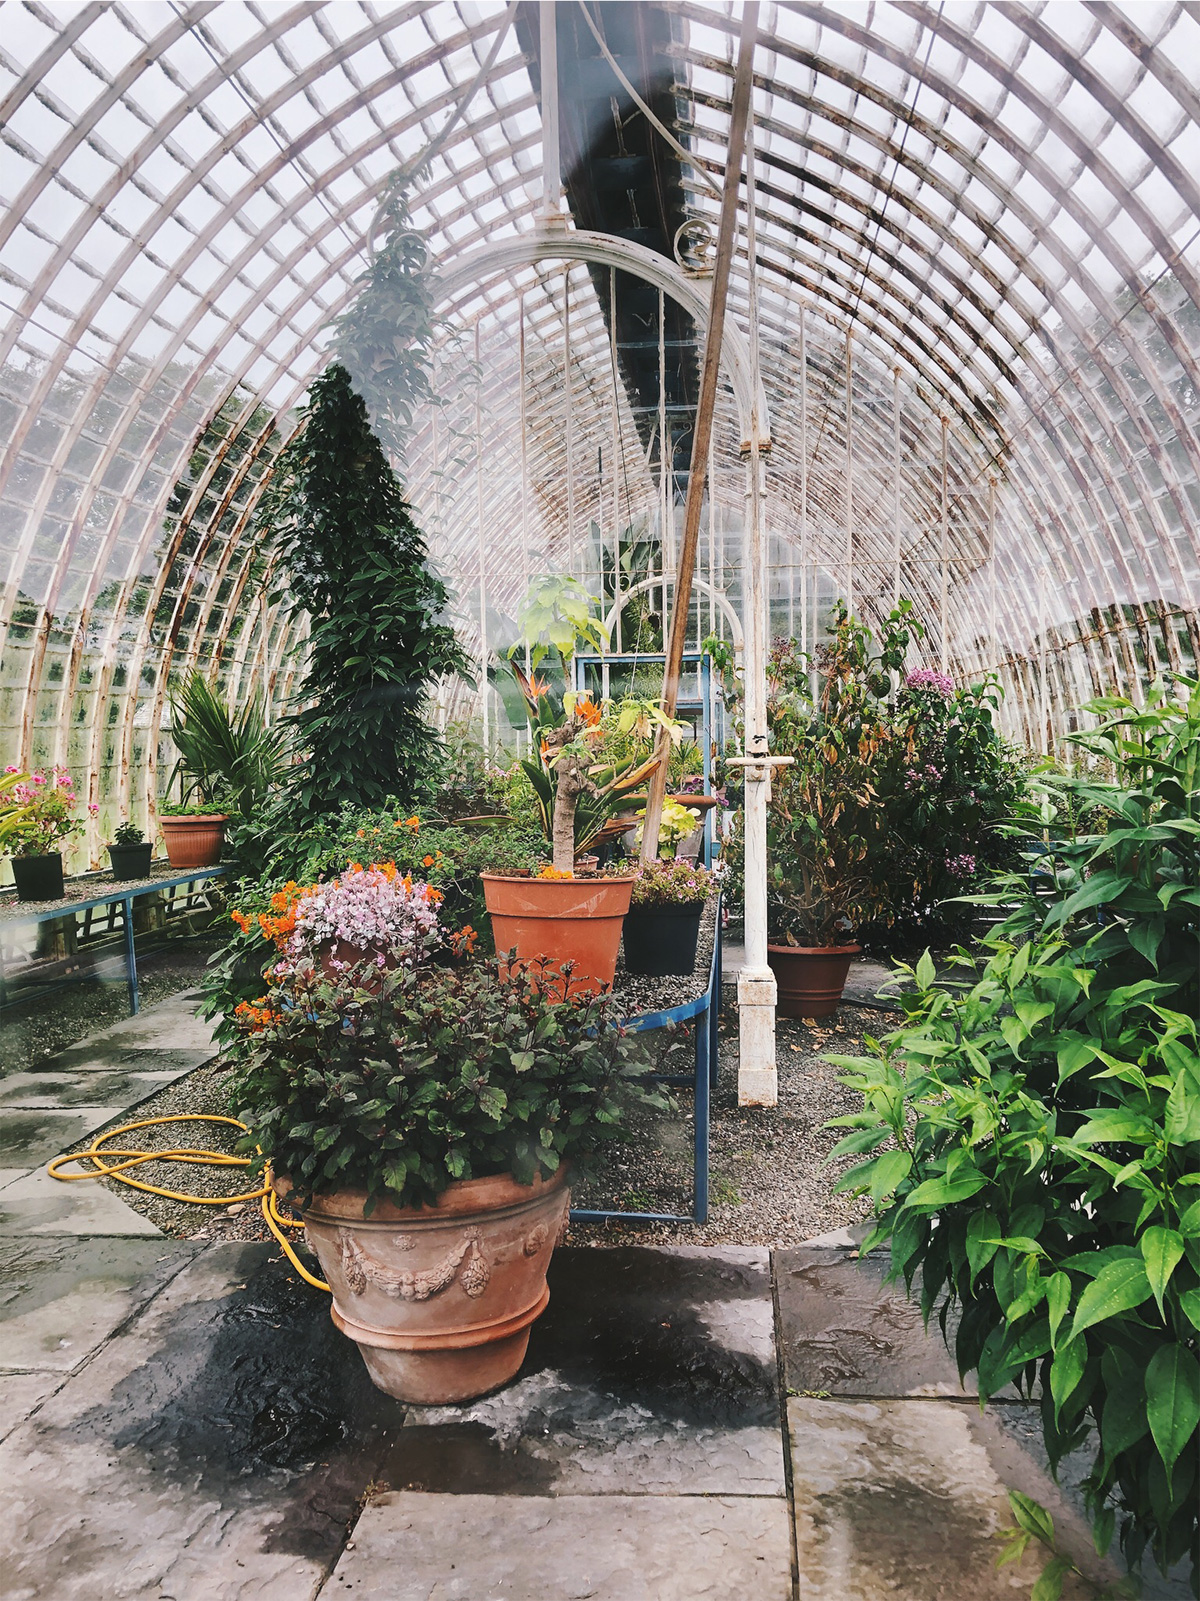 Irland Kerry Muckrose House Greenhouse